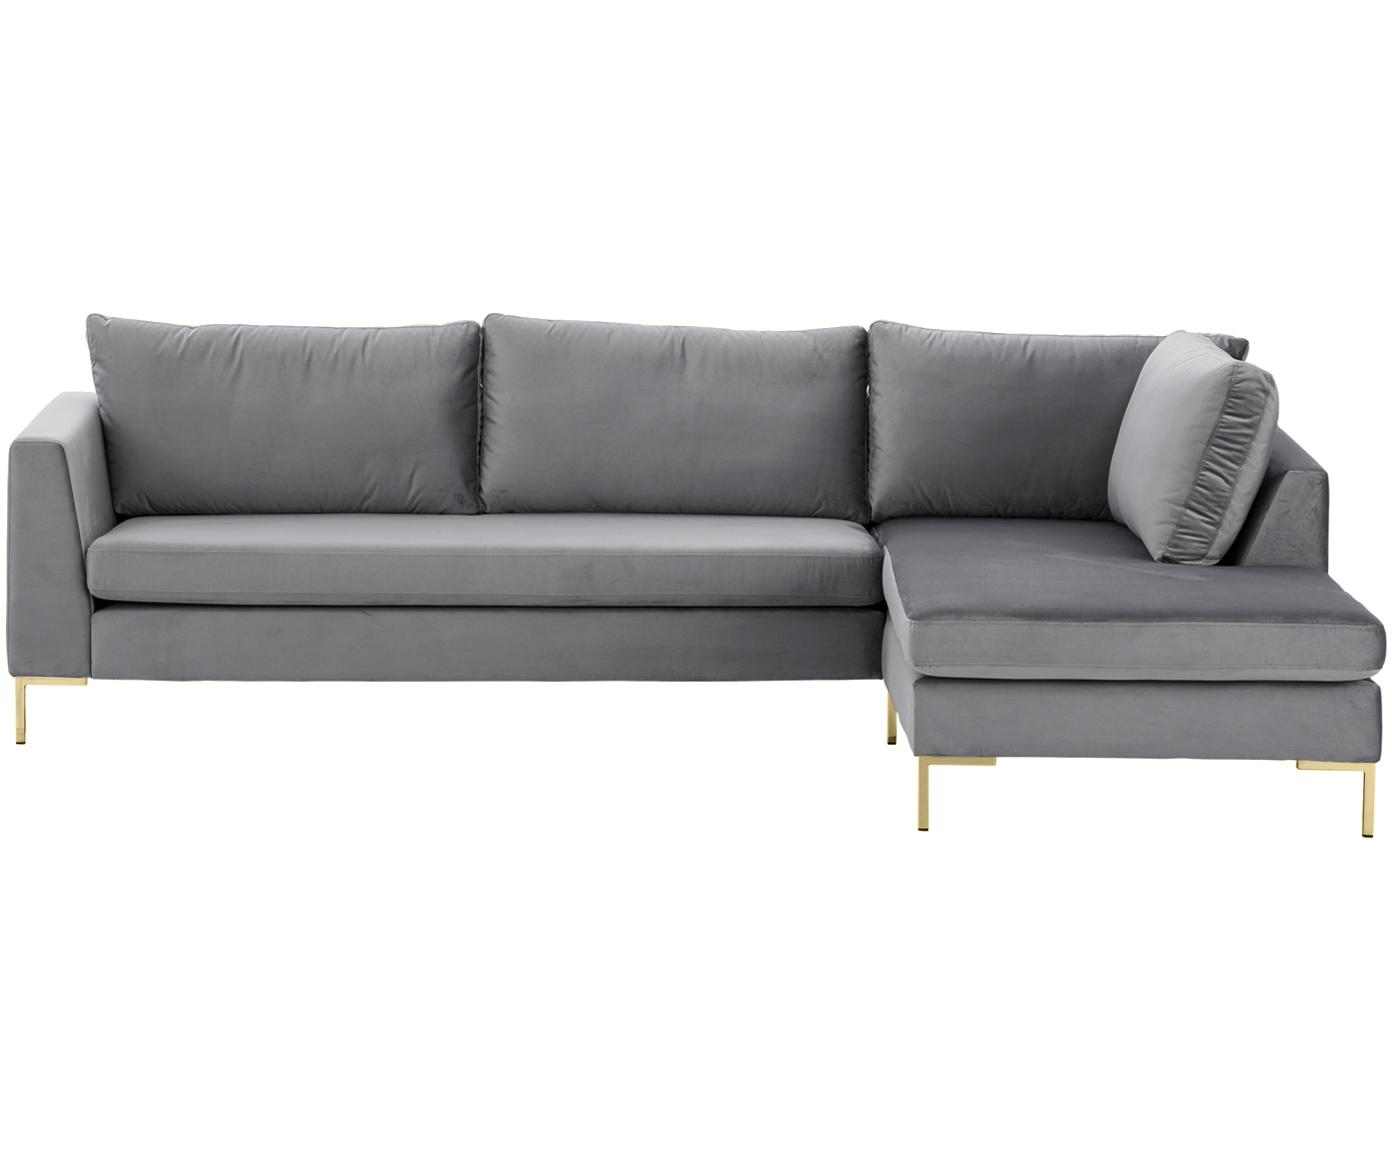 Samt-Ecksofa Luna, Bezug: Samt (Polyester) 80.000 S, Gestell: Massives Buchenholz, Füße: Metall, galvanisiert, Samt Dunkelgrau,Gold, B 280 x T 184 cm